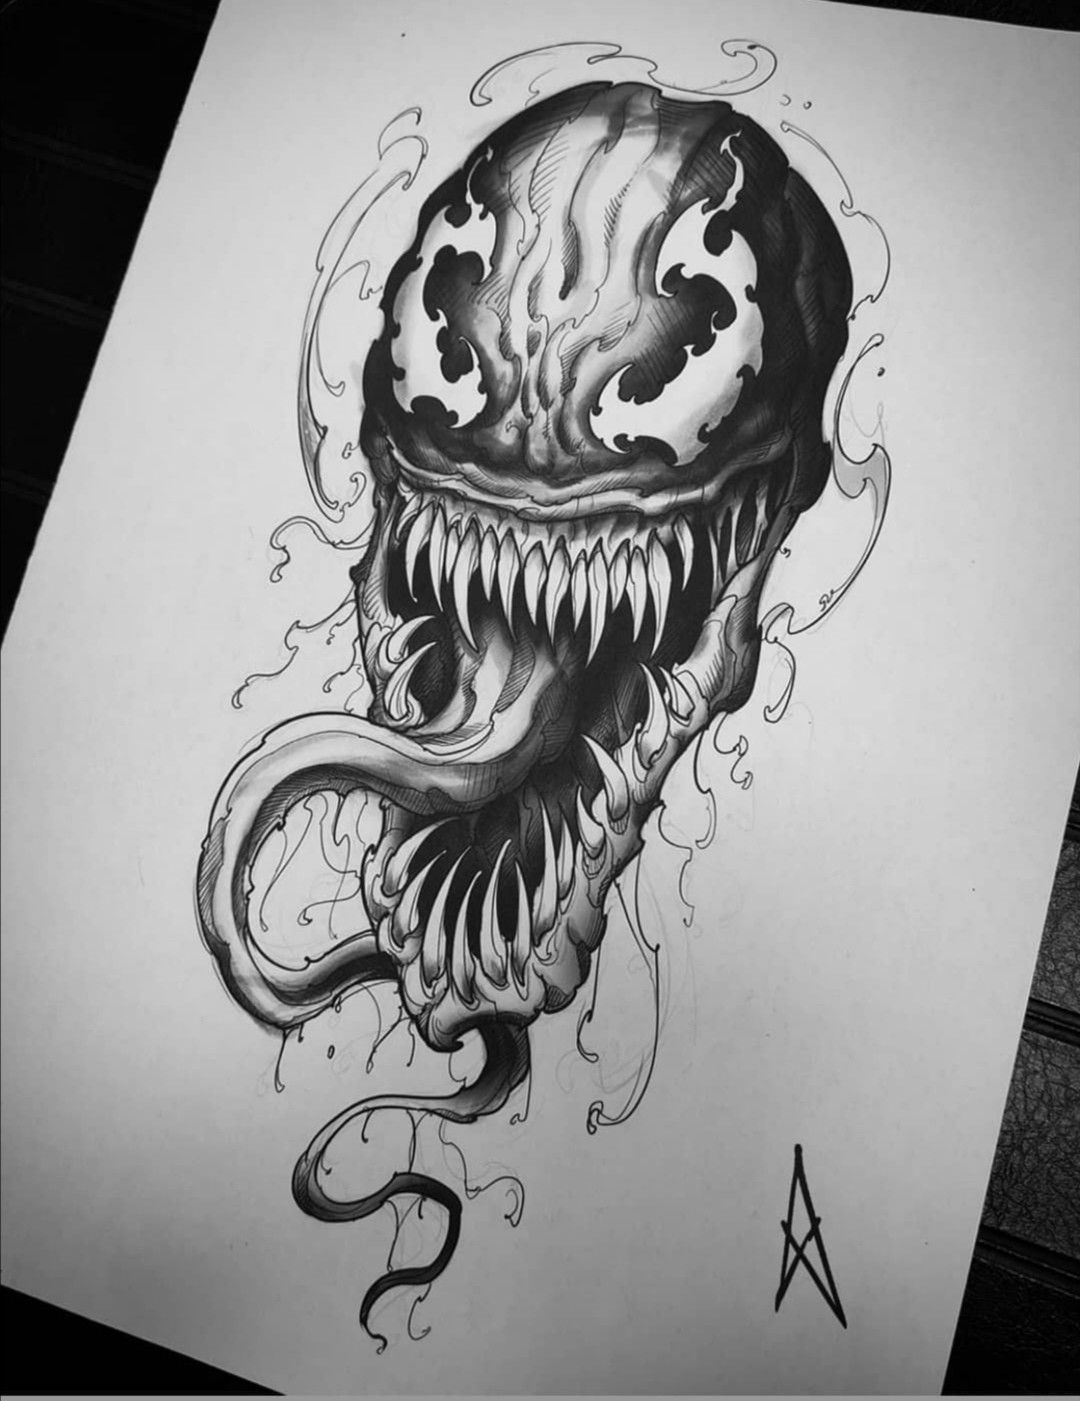 Pin By Bate Koce On Comics Game Desenho Sketch Tattoo Design Venom Tattoo Tattoo Design Drawings